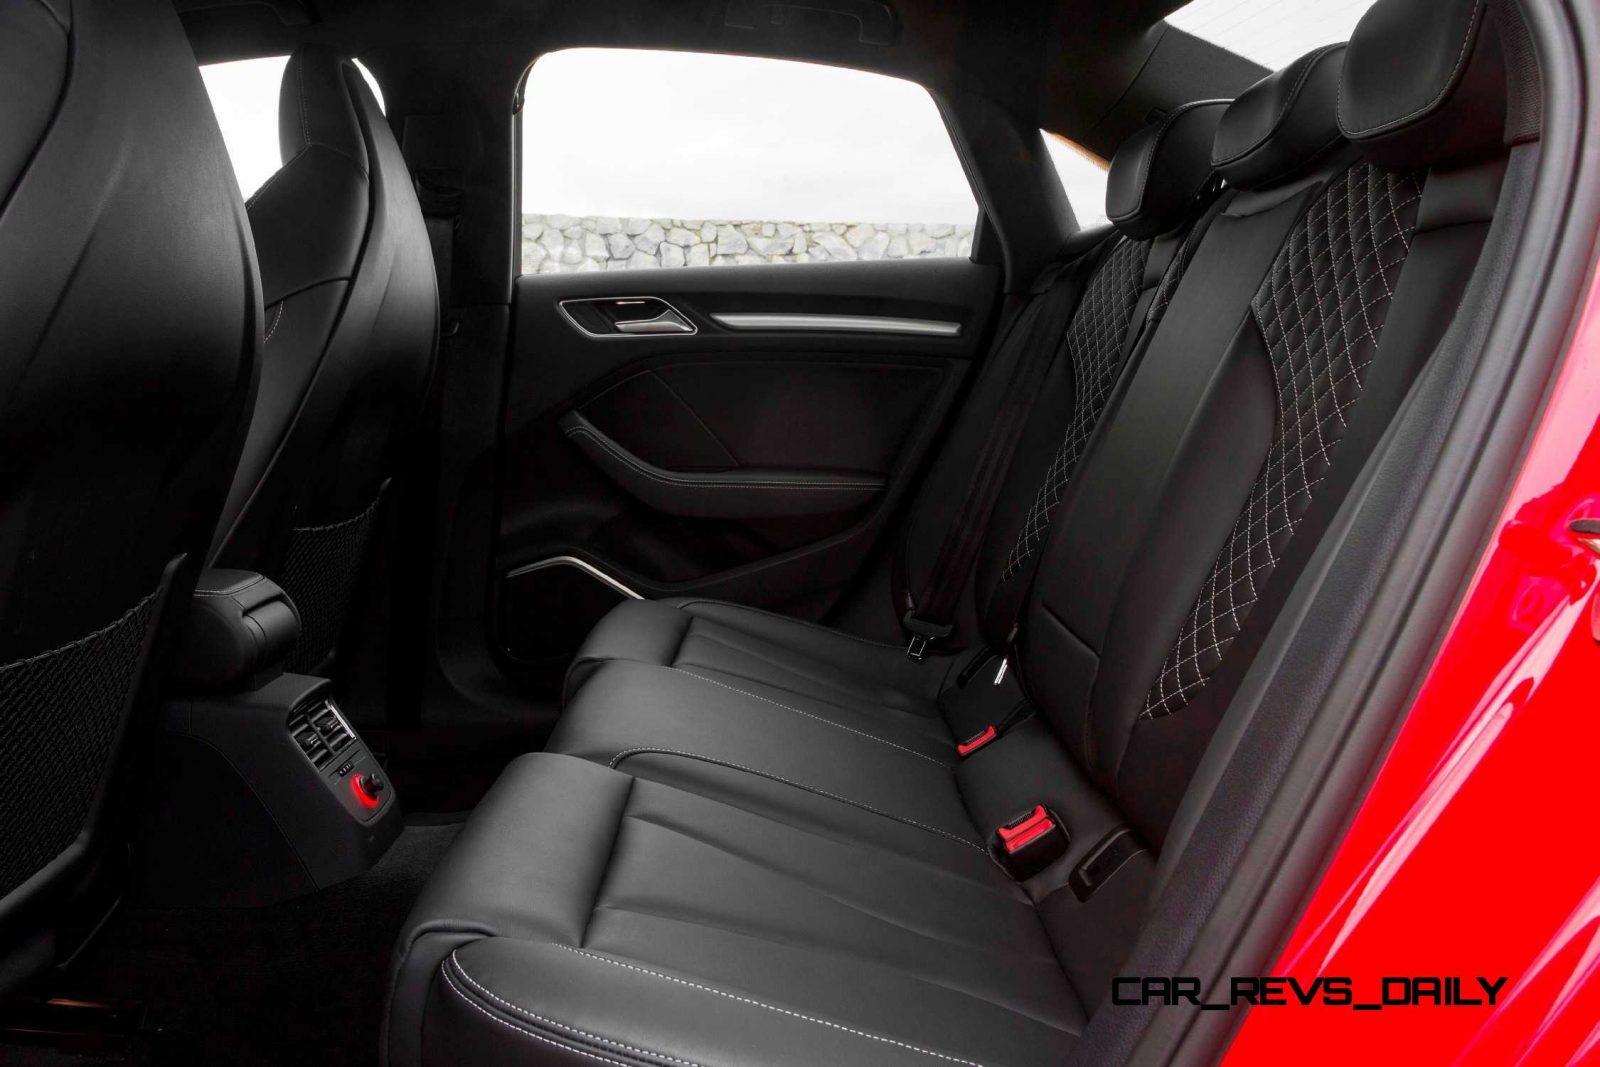 CarRevsDaily - 2015 Audi S3 Interior 7